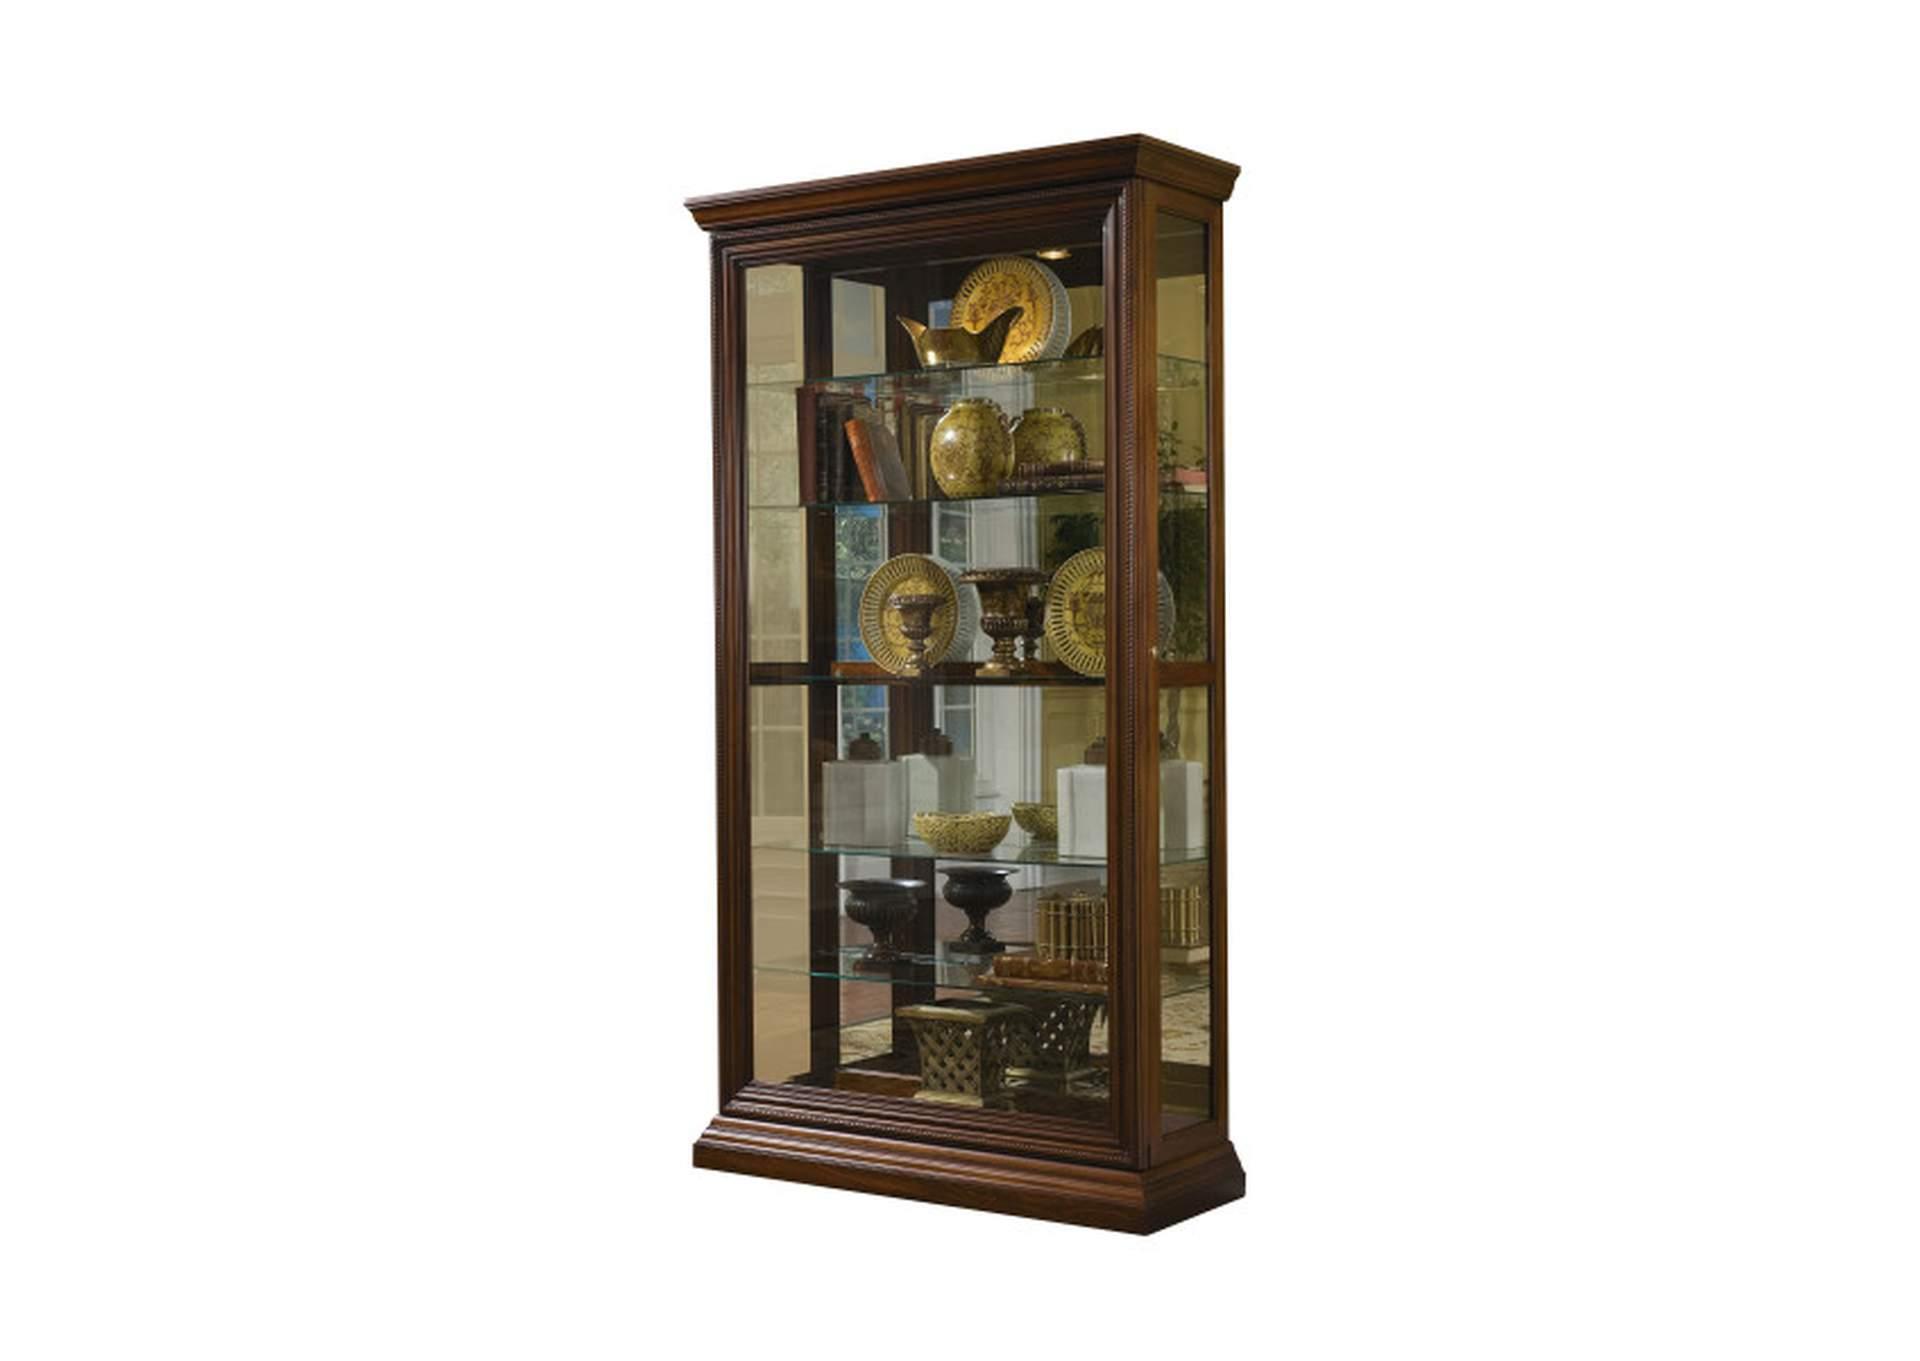 Pfc Curios Oak Brown Edwardian 5 Shelf Sliding Door Curio Cabinet Luxury Home Furniture